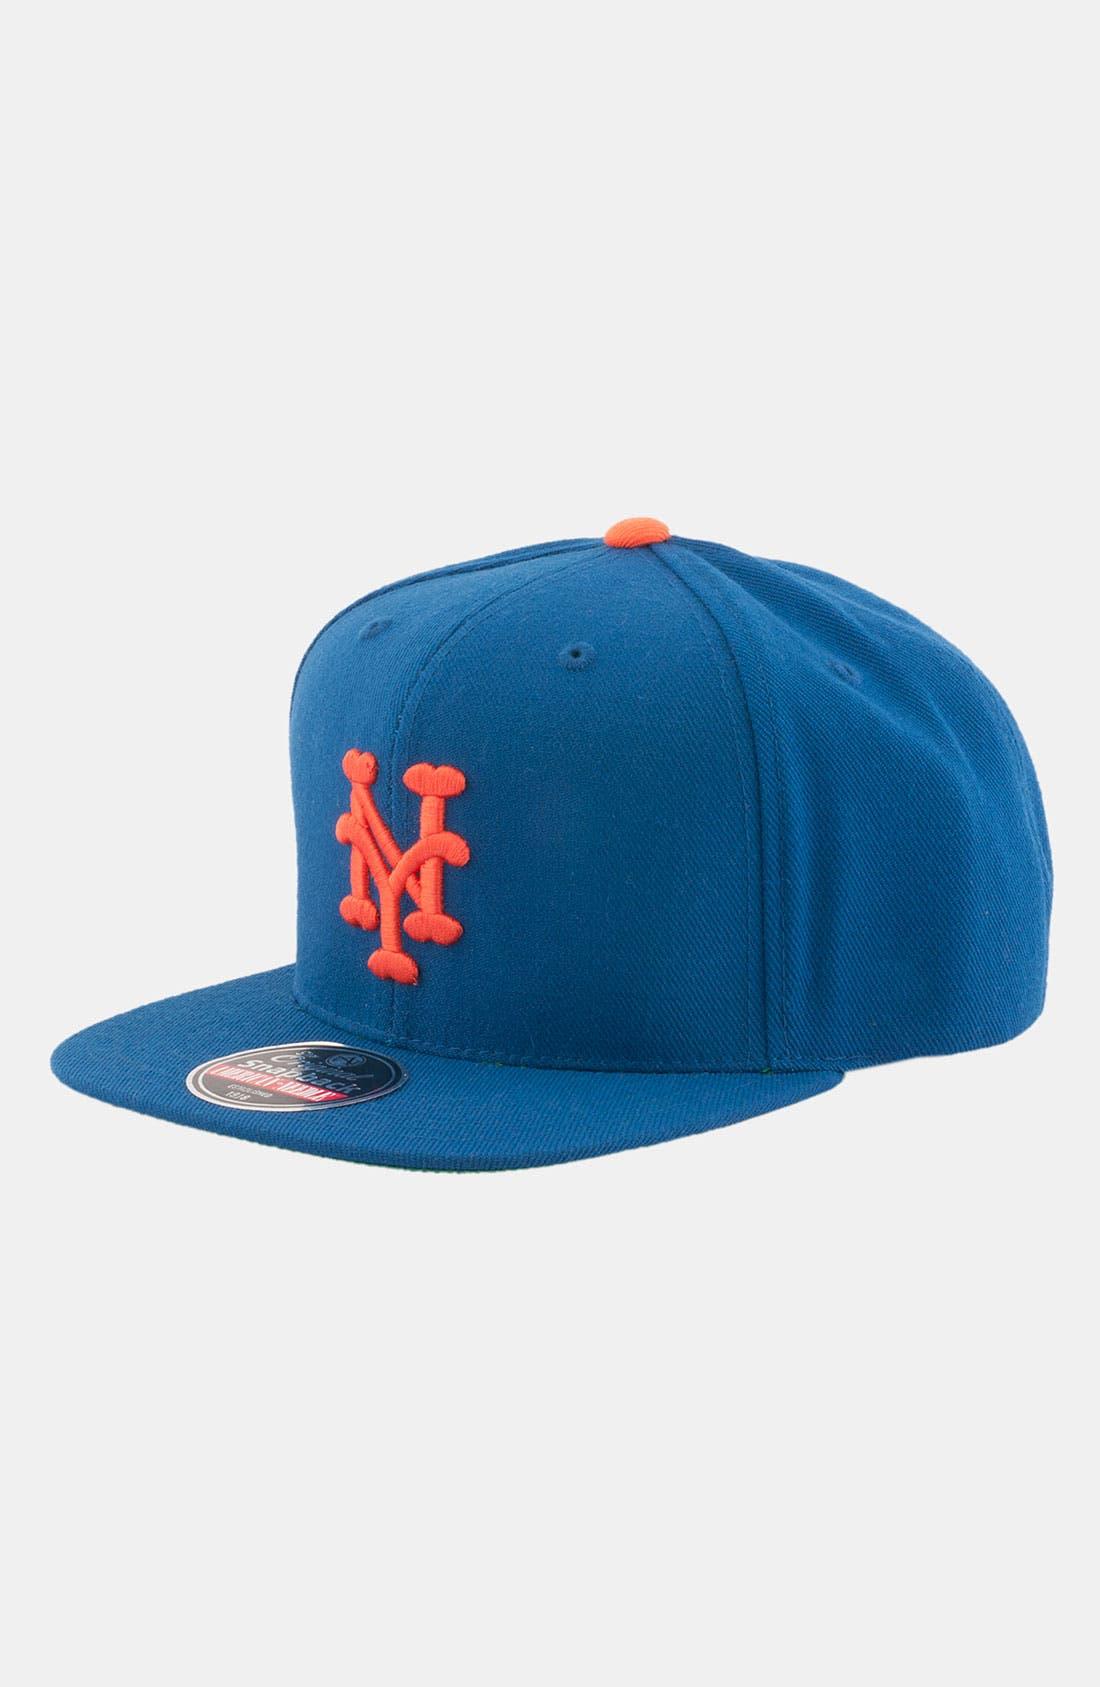 Alternate Image 1 Selected - American Needle 'New York Mets - Cooperstown' Snapback Baseball Cap